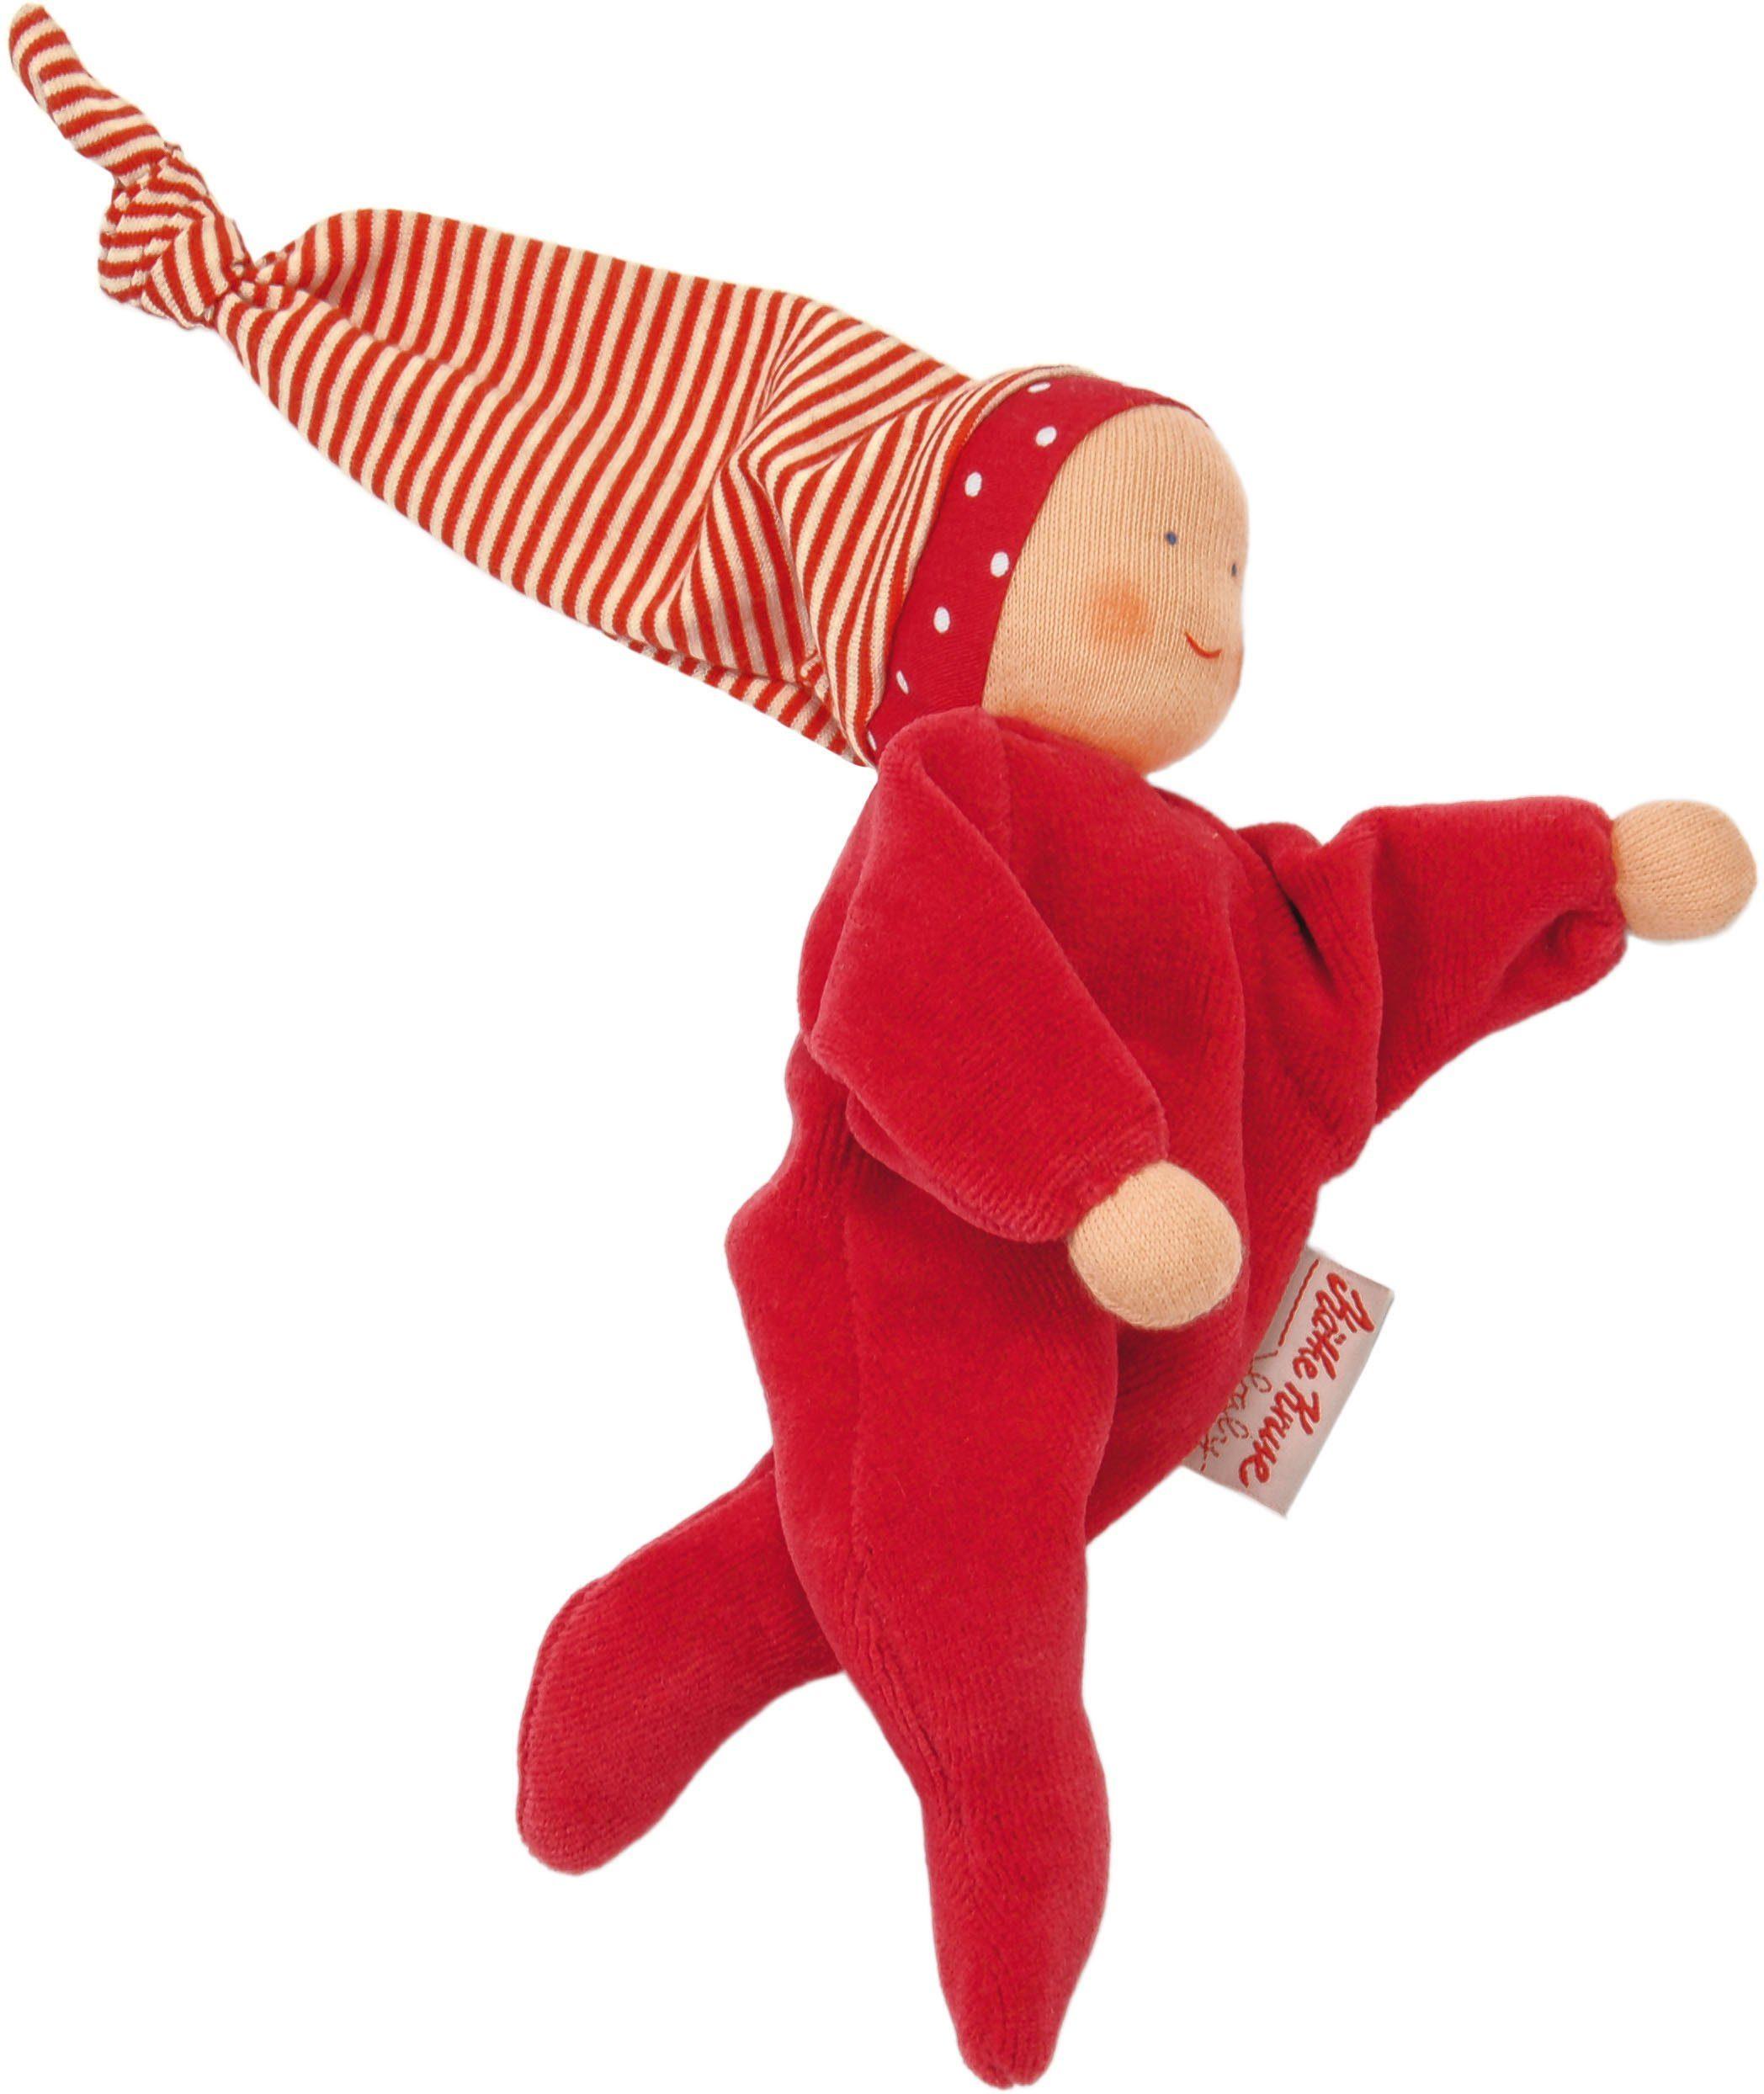 Käthe Kruse Stoffpuppe mit Zipfelmütze, »Nickibaby Rot«